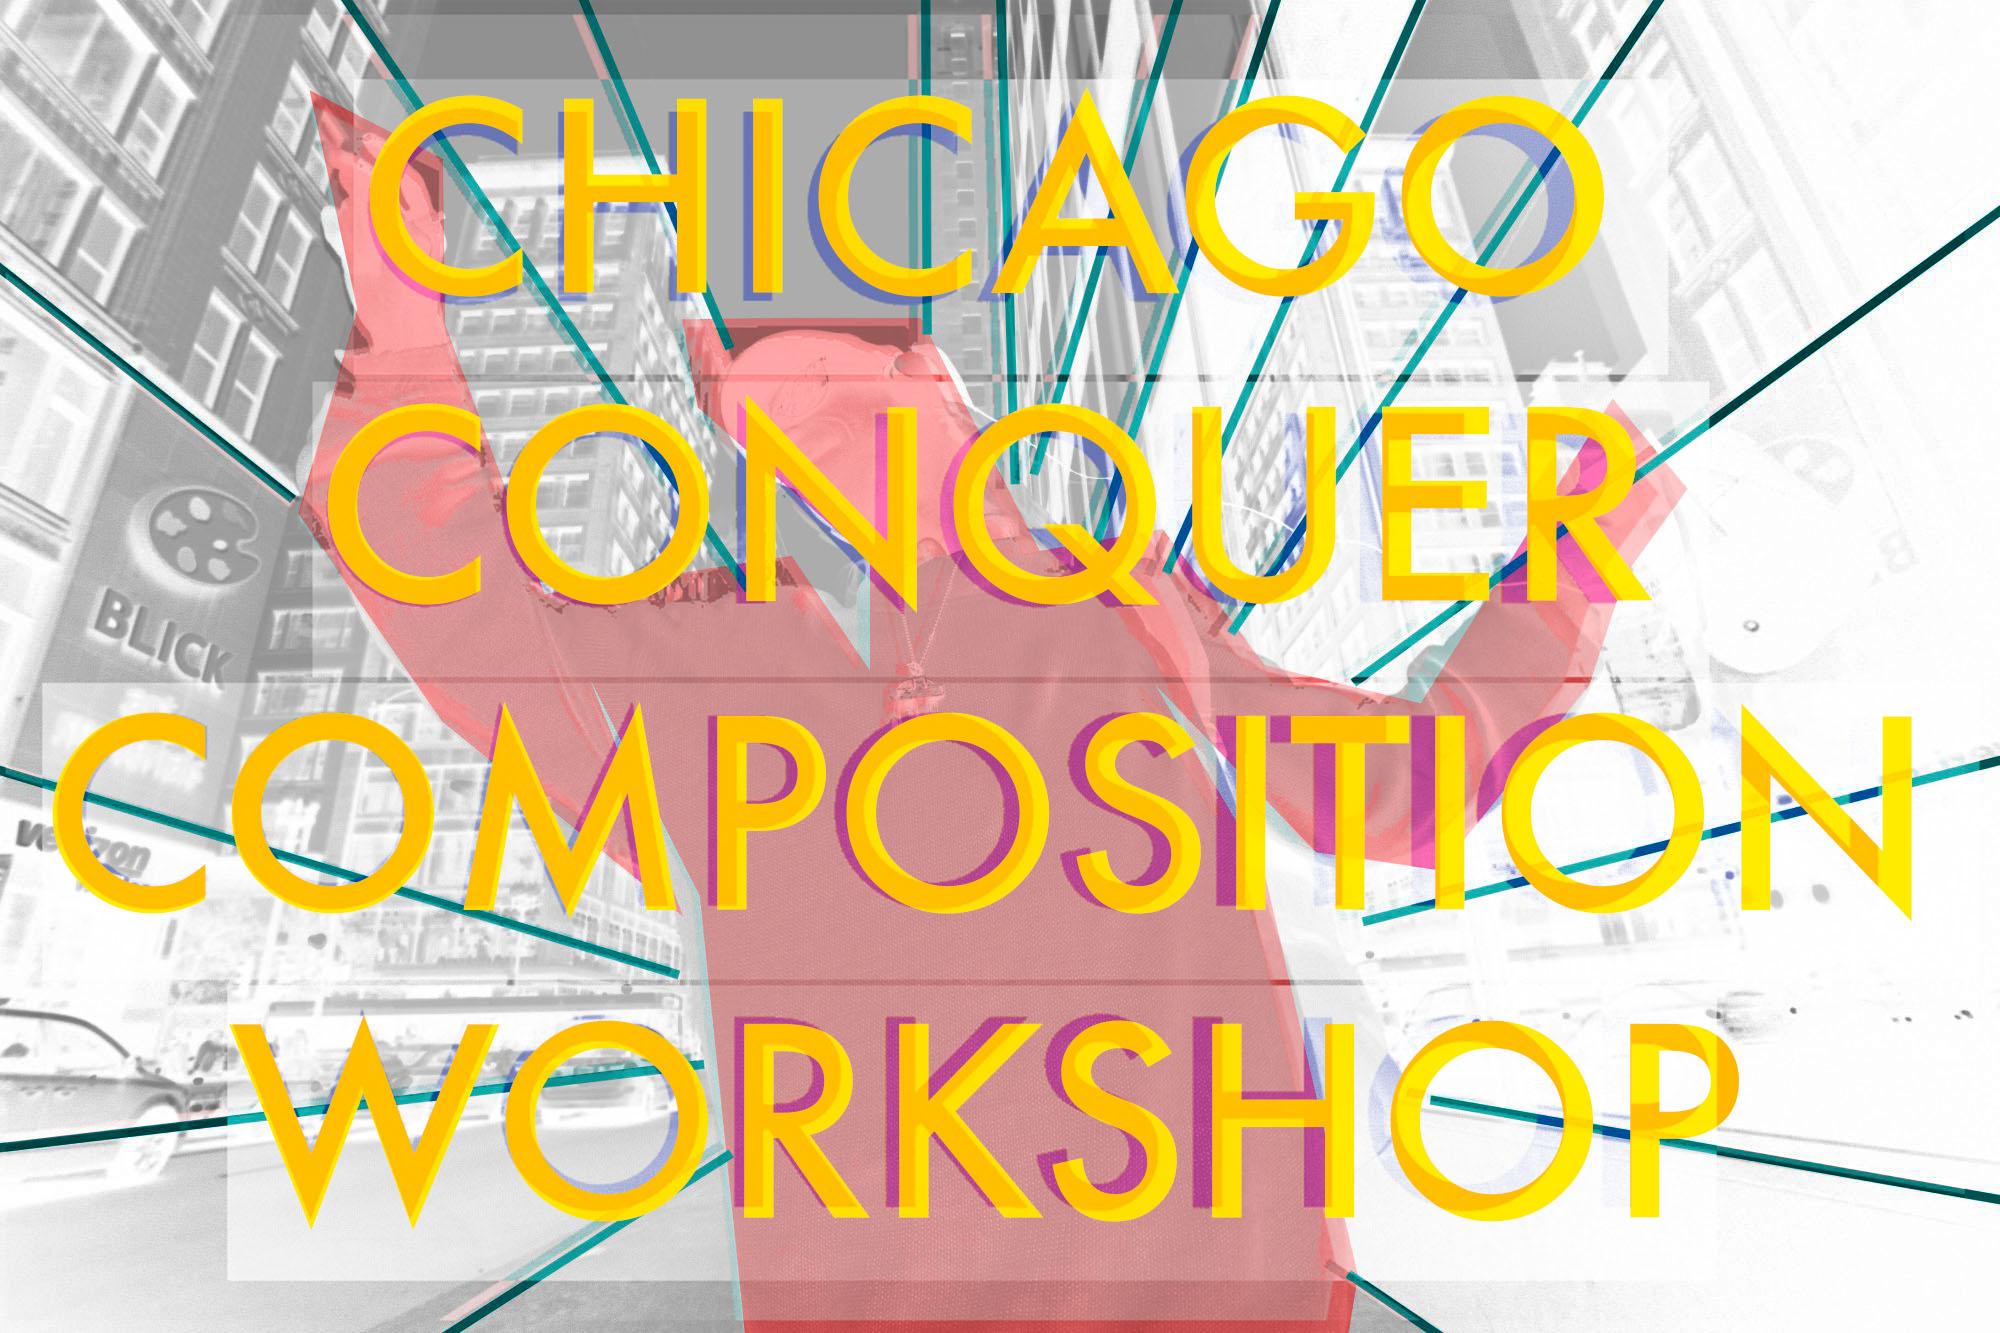 chicago conquer composition workshop ERIC KIM 2020